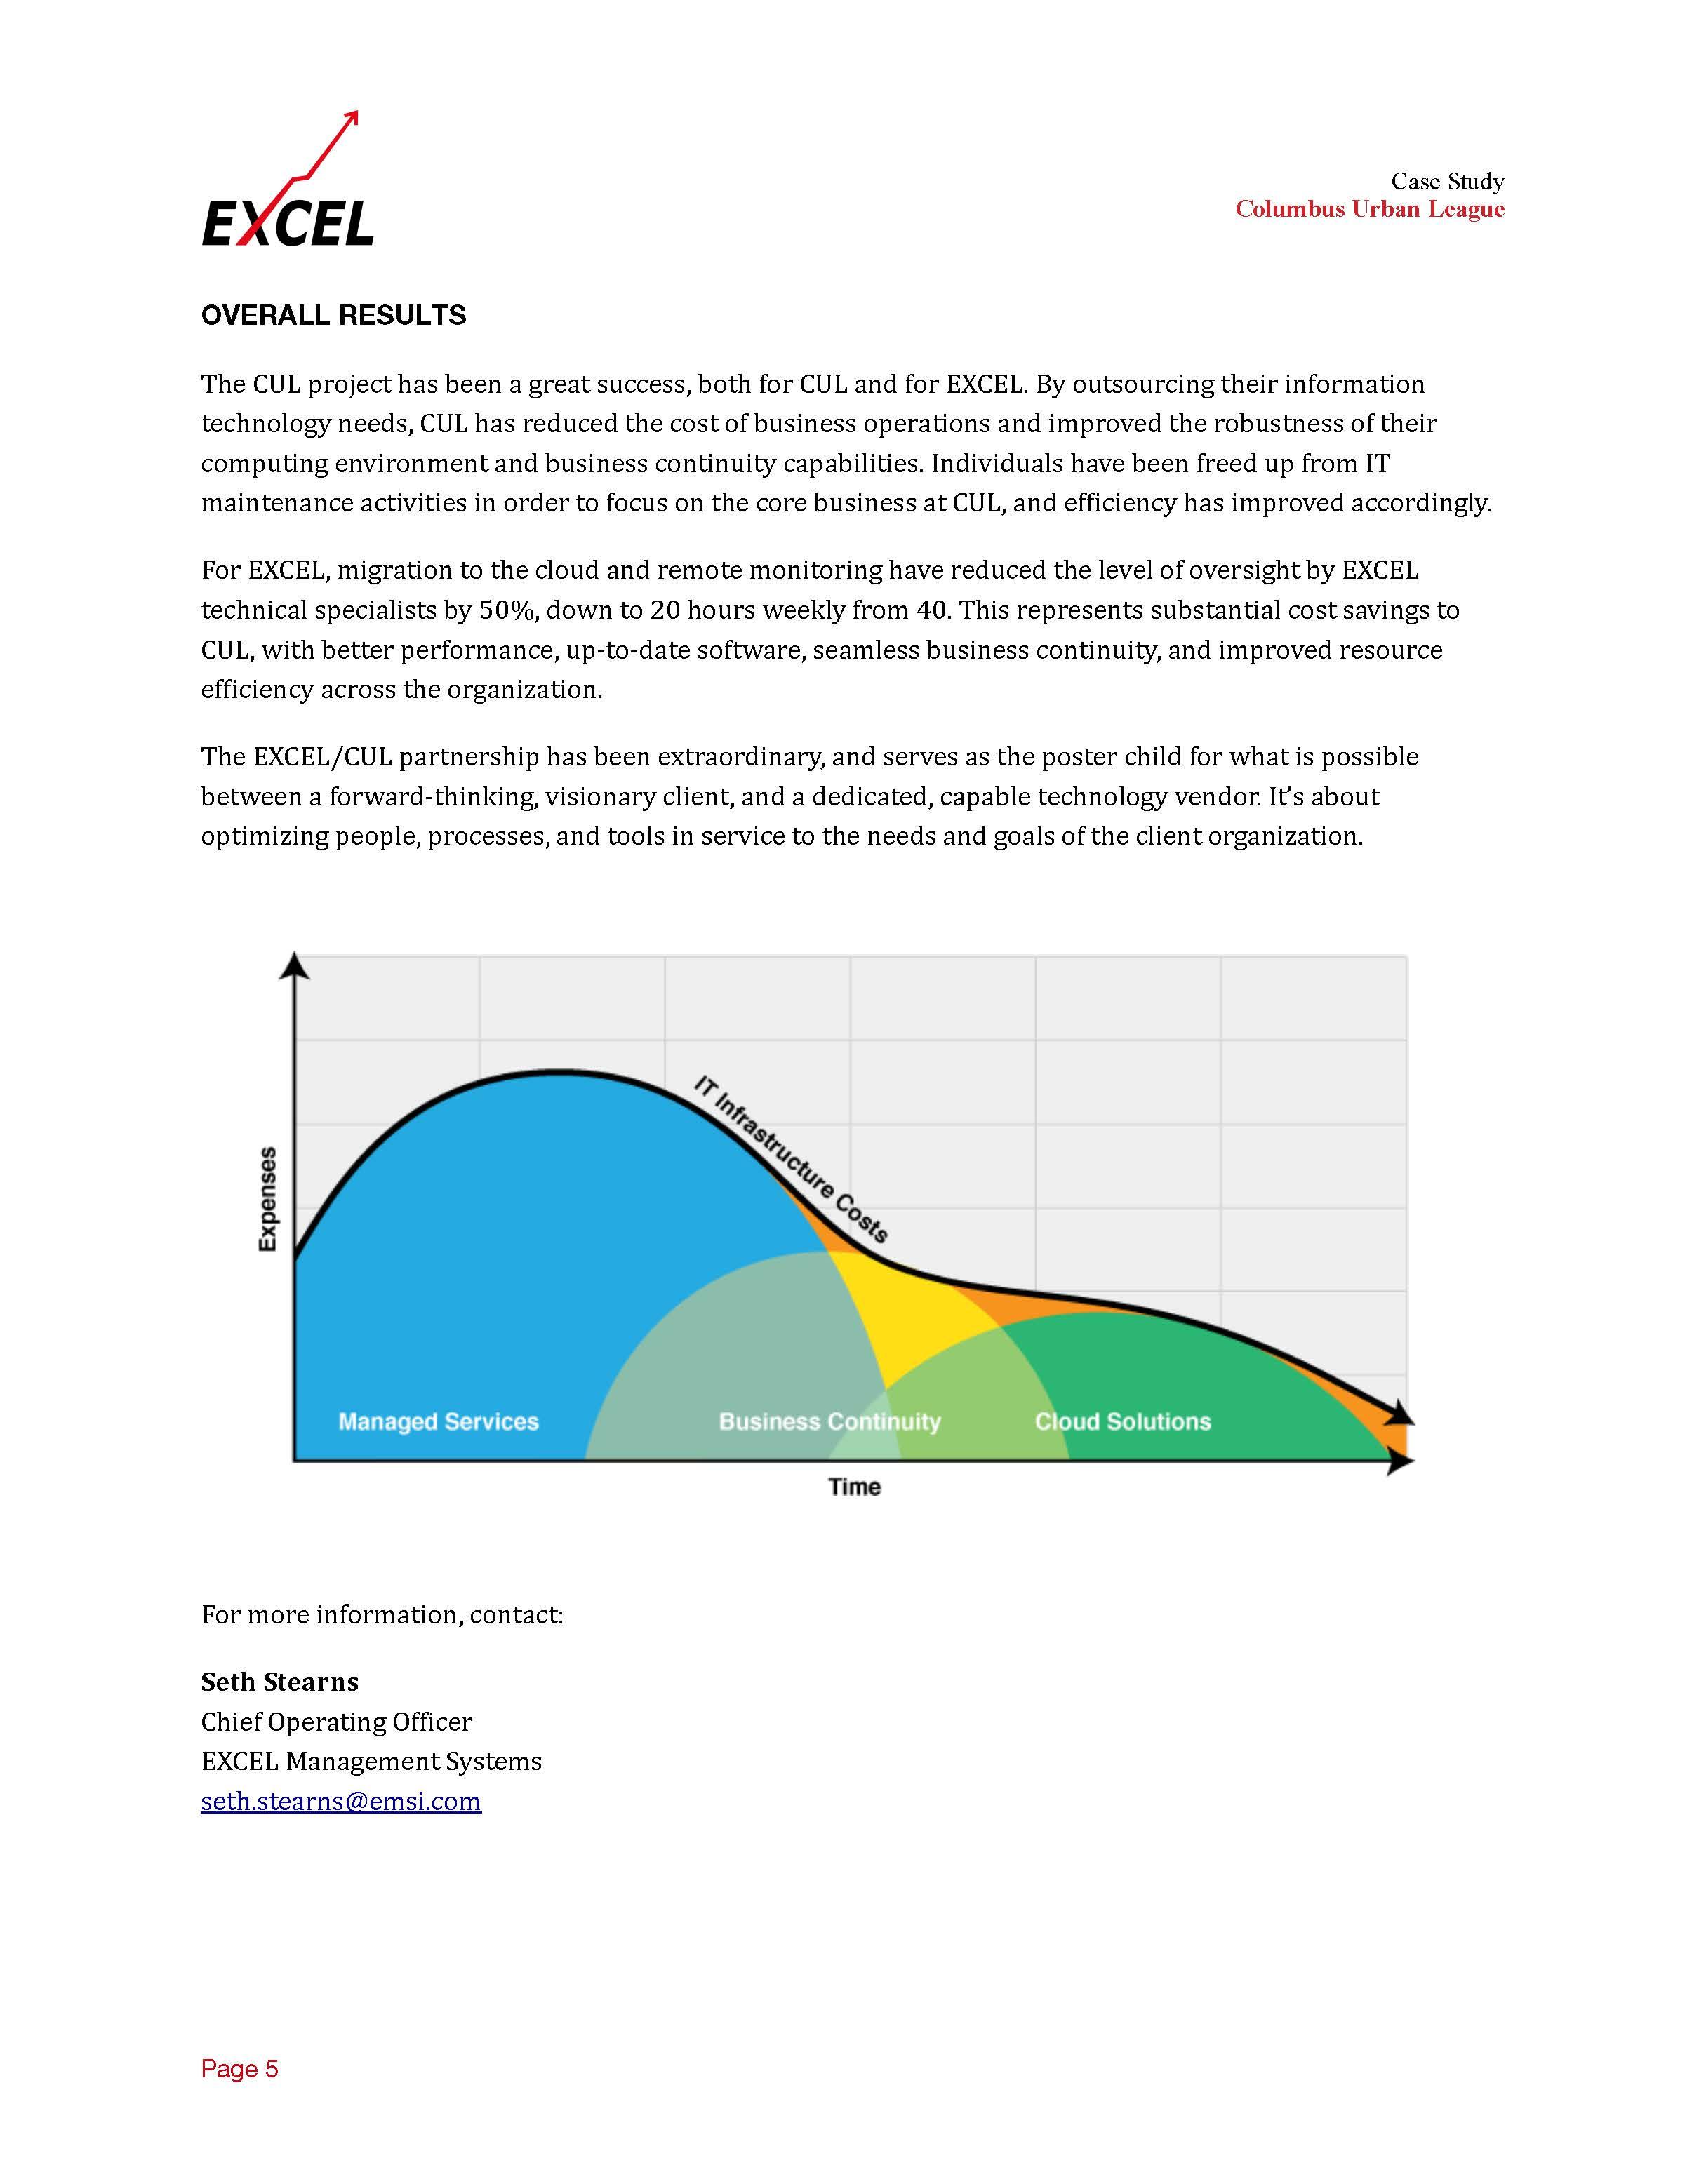 Case Study - CUL v3_Page_5.jpg